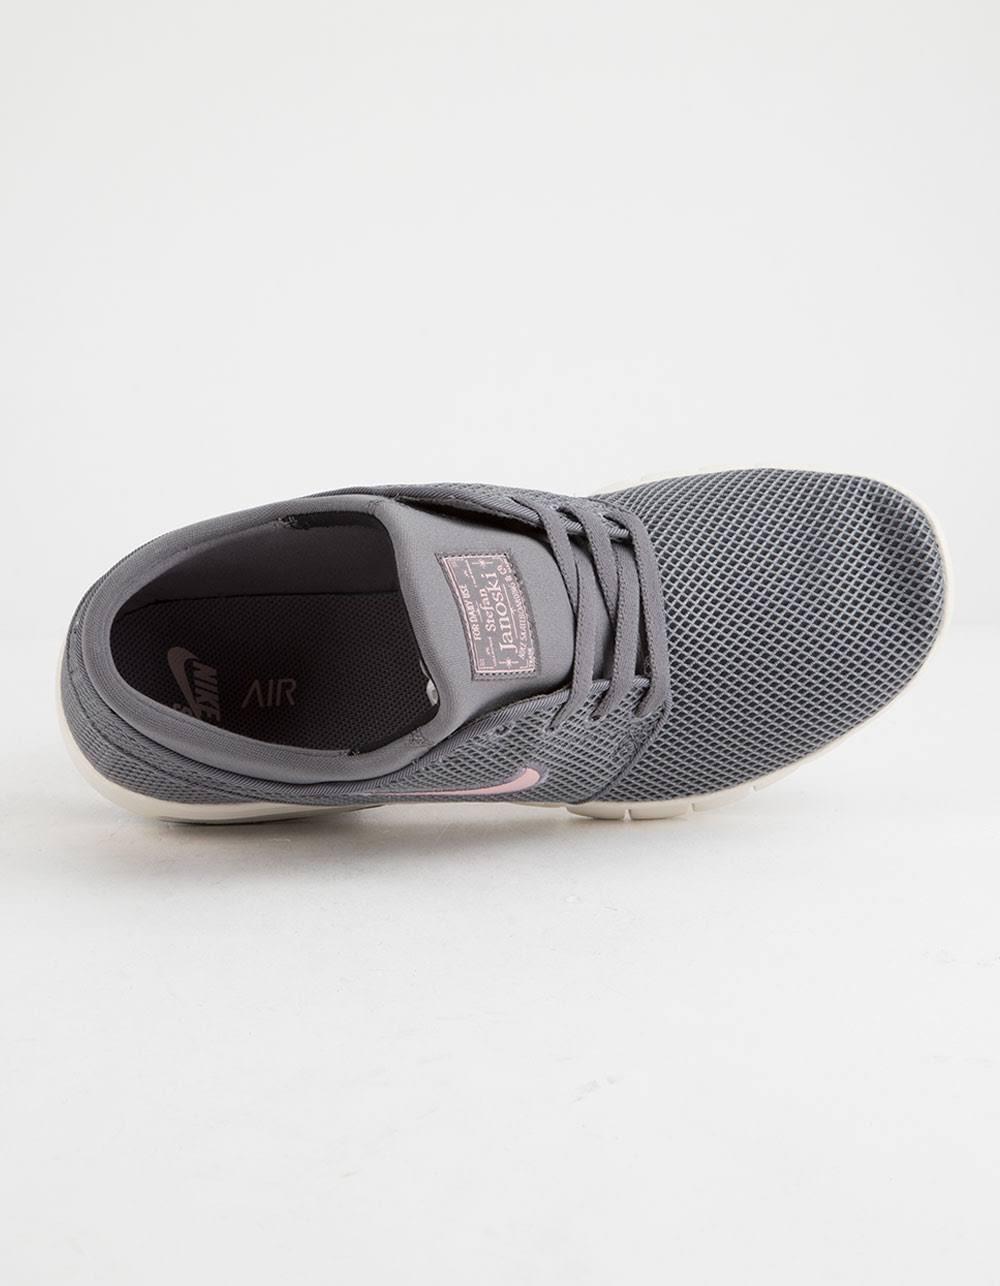 Para Talla Zapatos 8 631303030 Sb Bubblegum Stefan Max Nike Gunsmoke Hombre phantom Janoski qRZAXFw